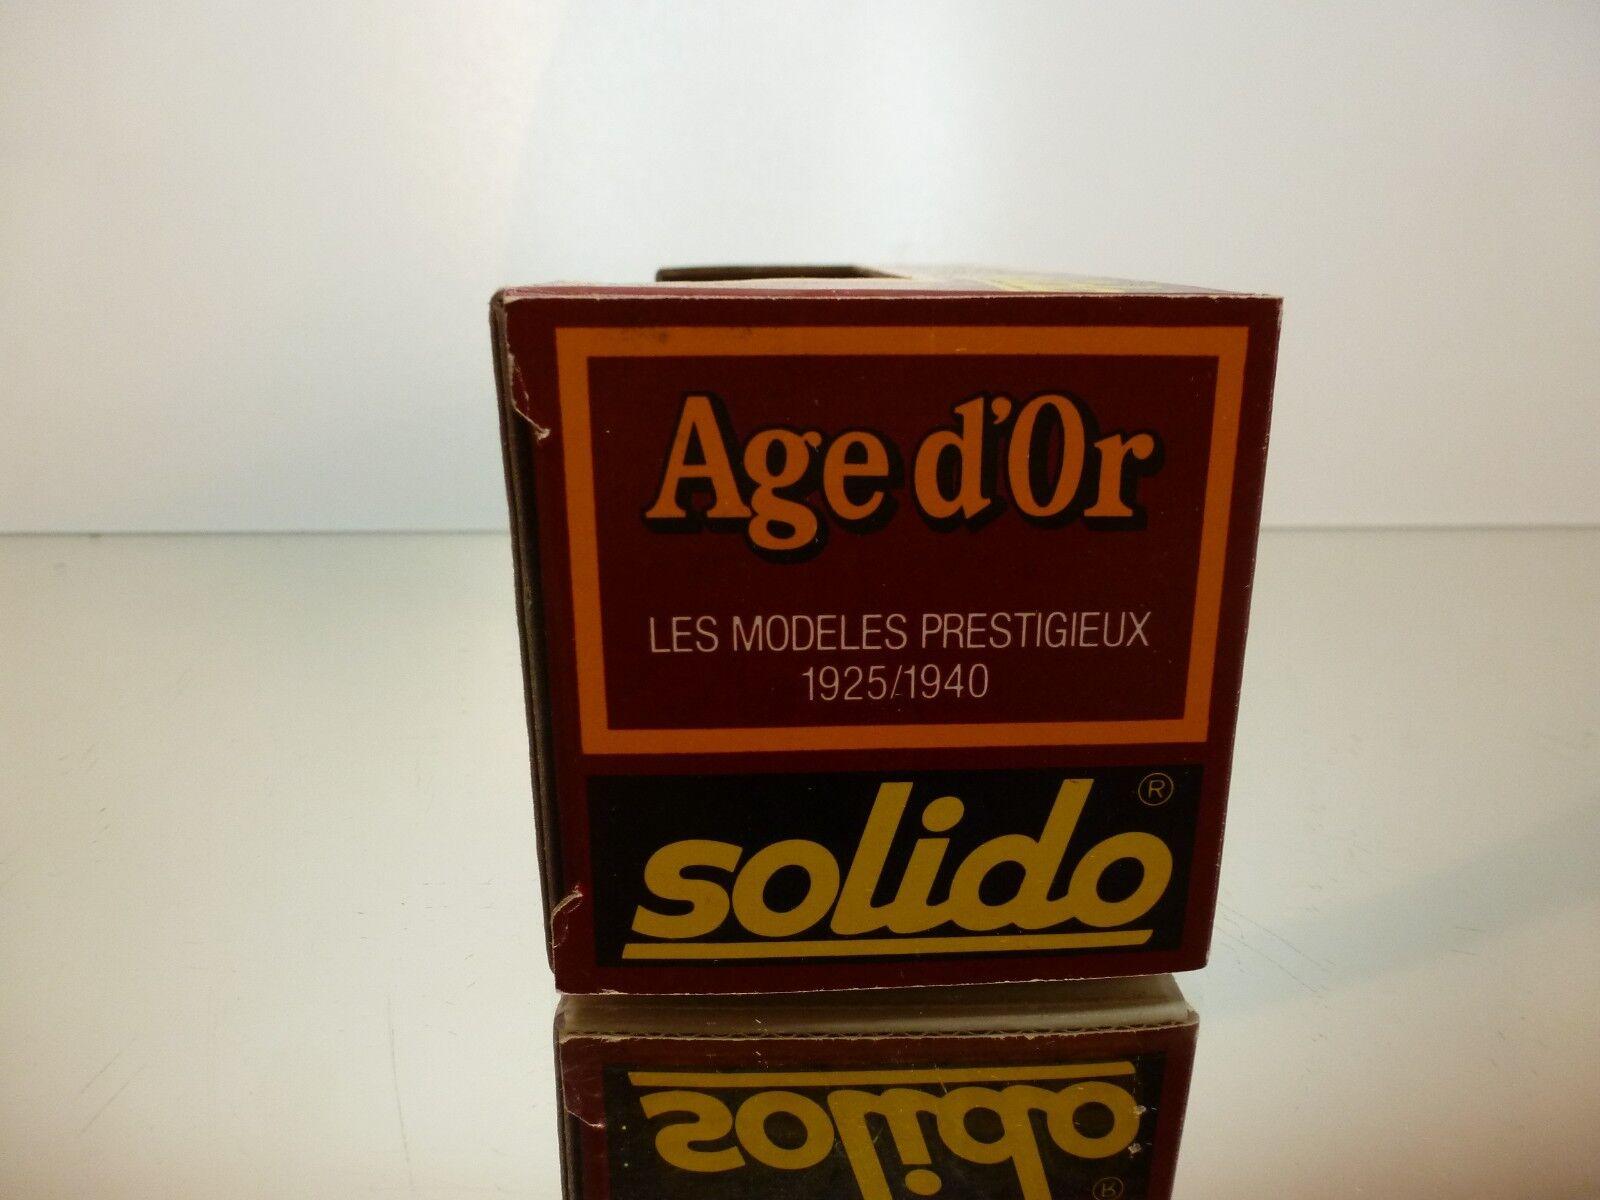 SOLIDO 32A CITROEN 15CV 1938 SAPEURS SAPEURS SAPEURS POMPIERS - RED 1 43 - VERY GOOD IN BOX 10339b